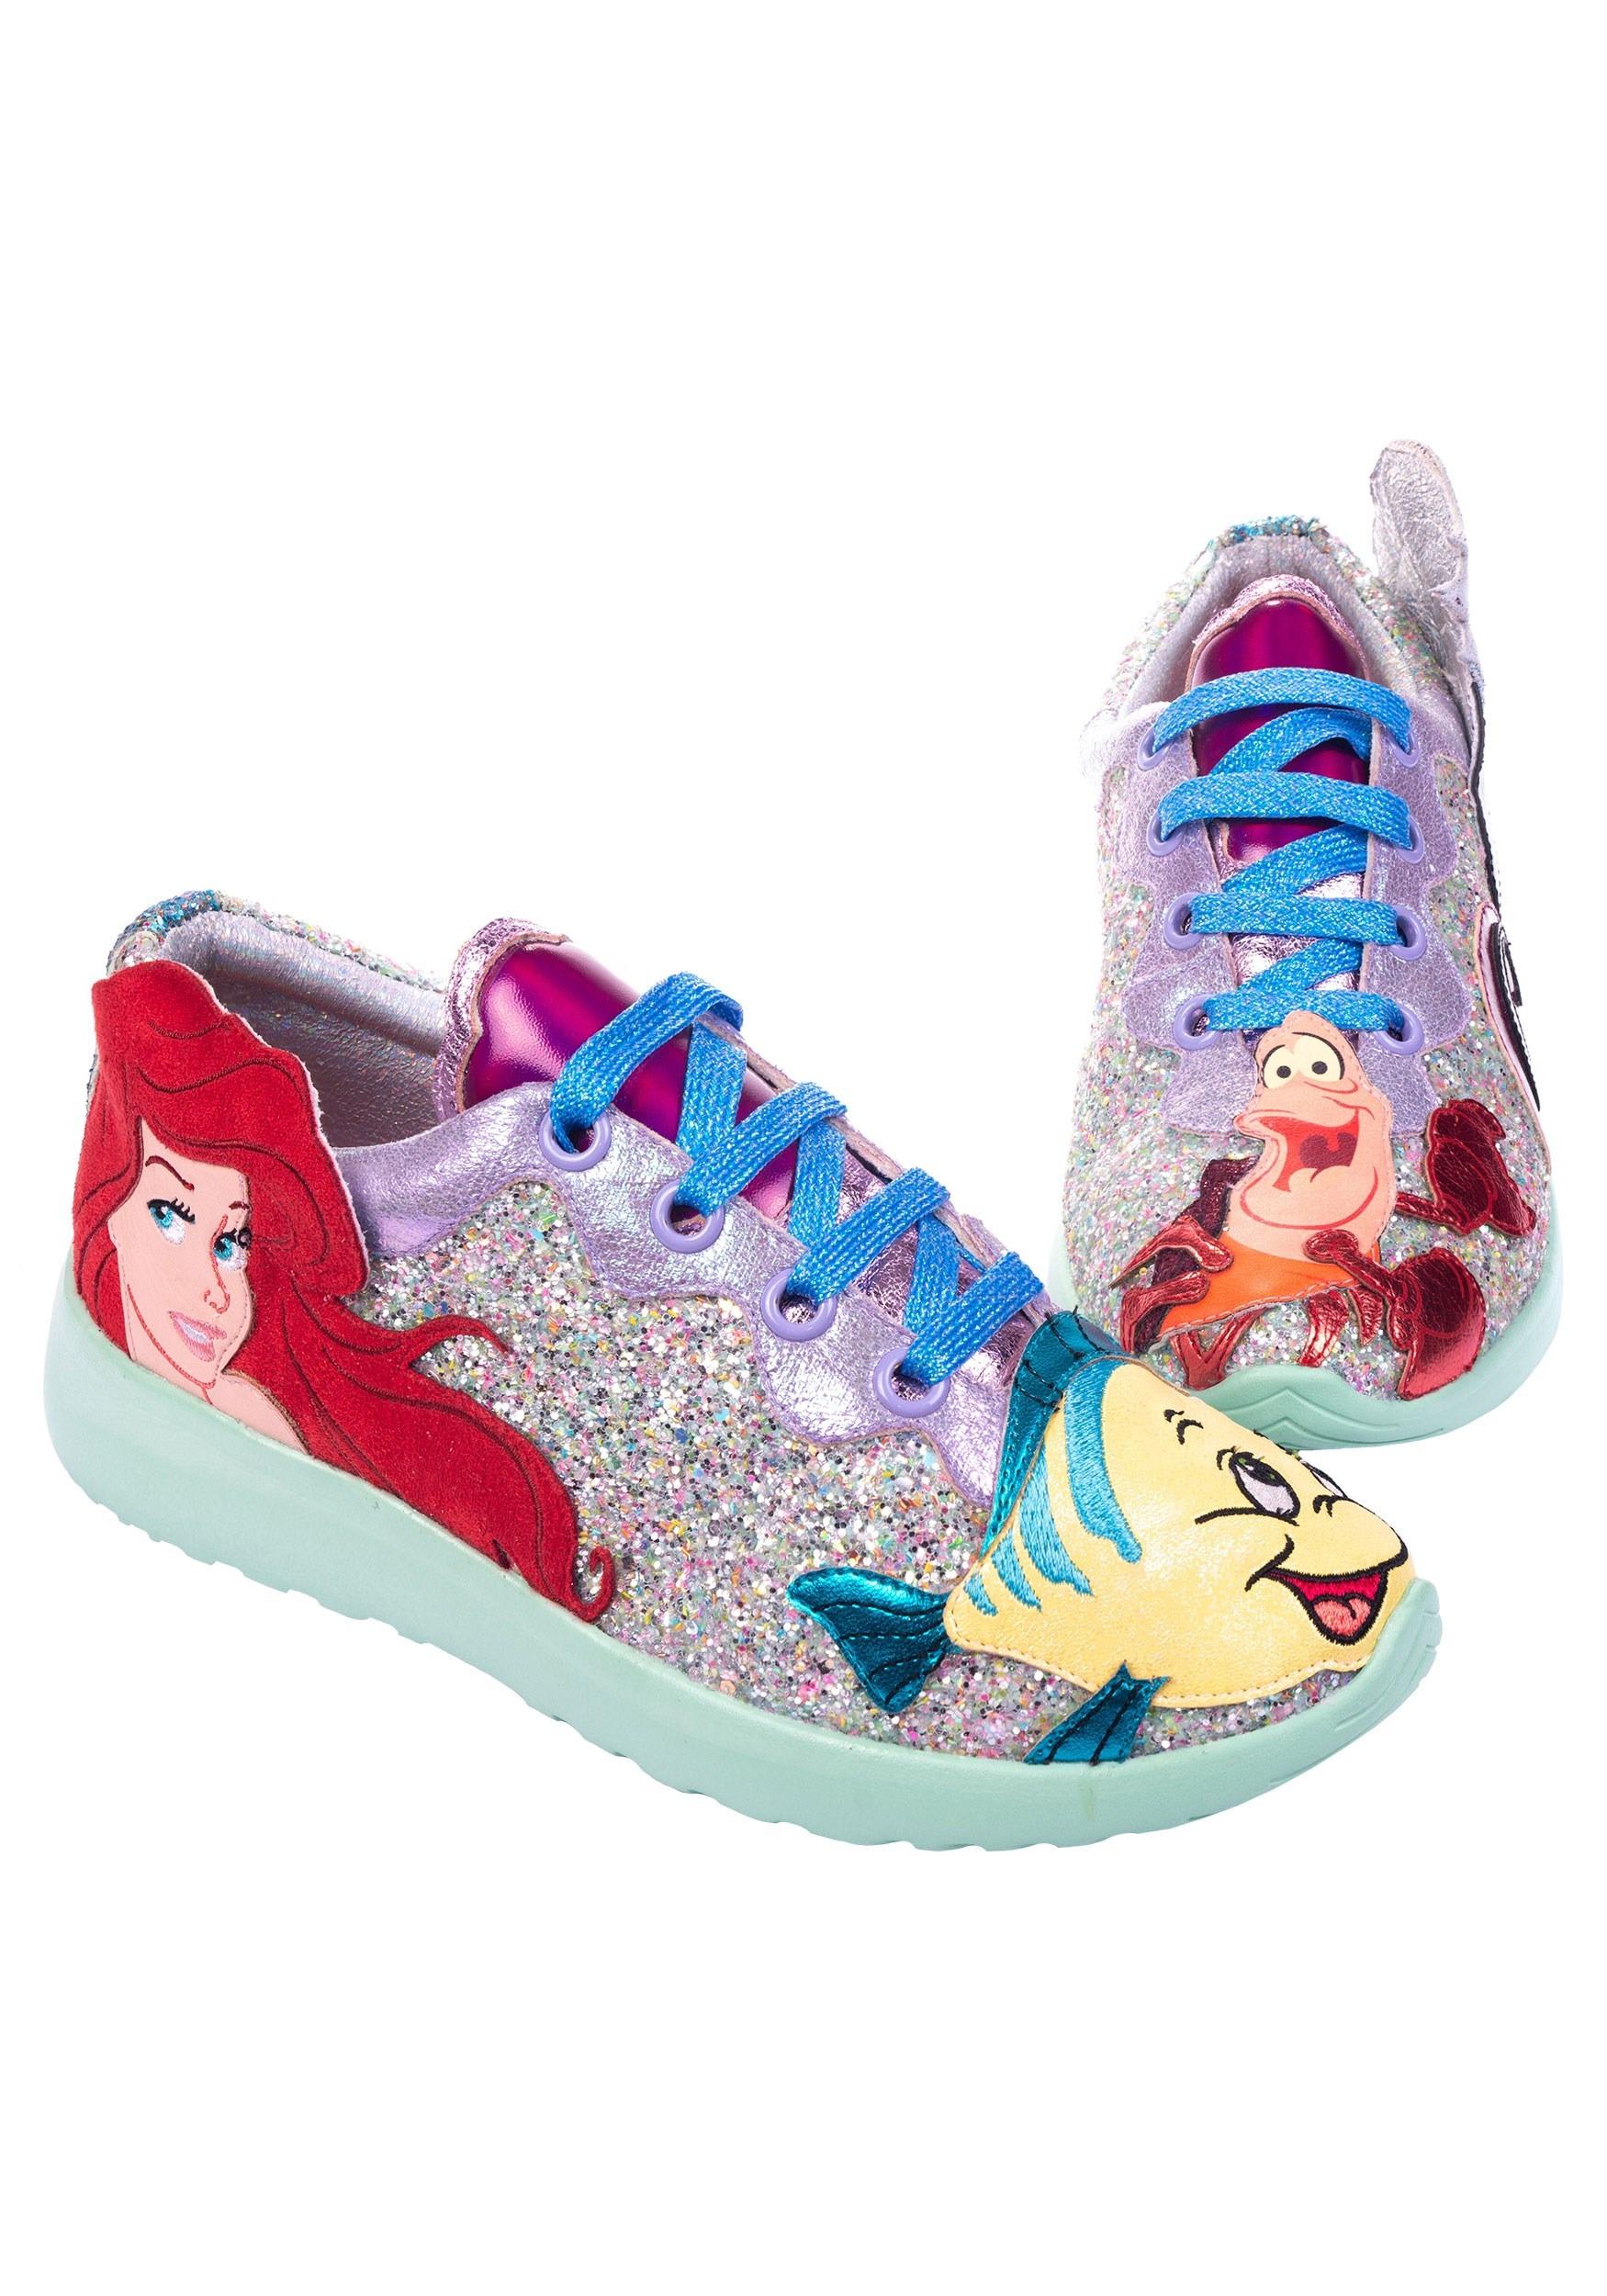 Little Mermaid Total Catch Sneakers